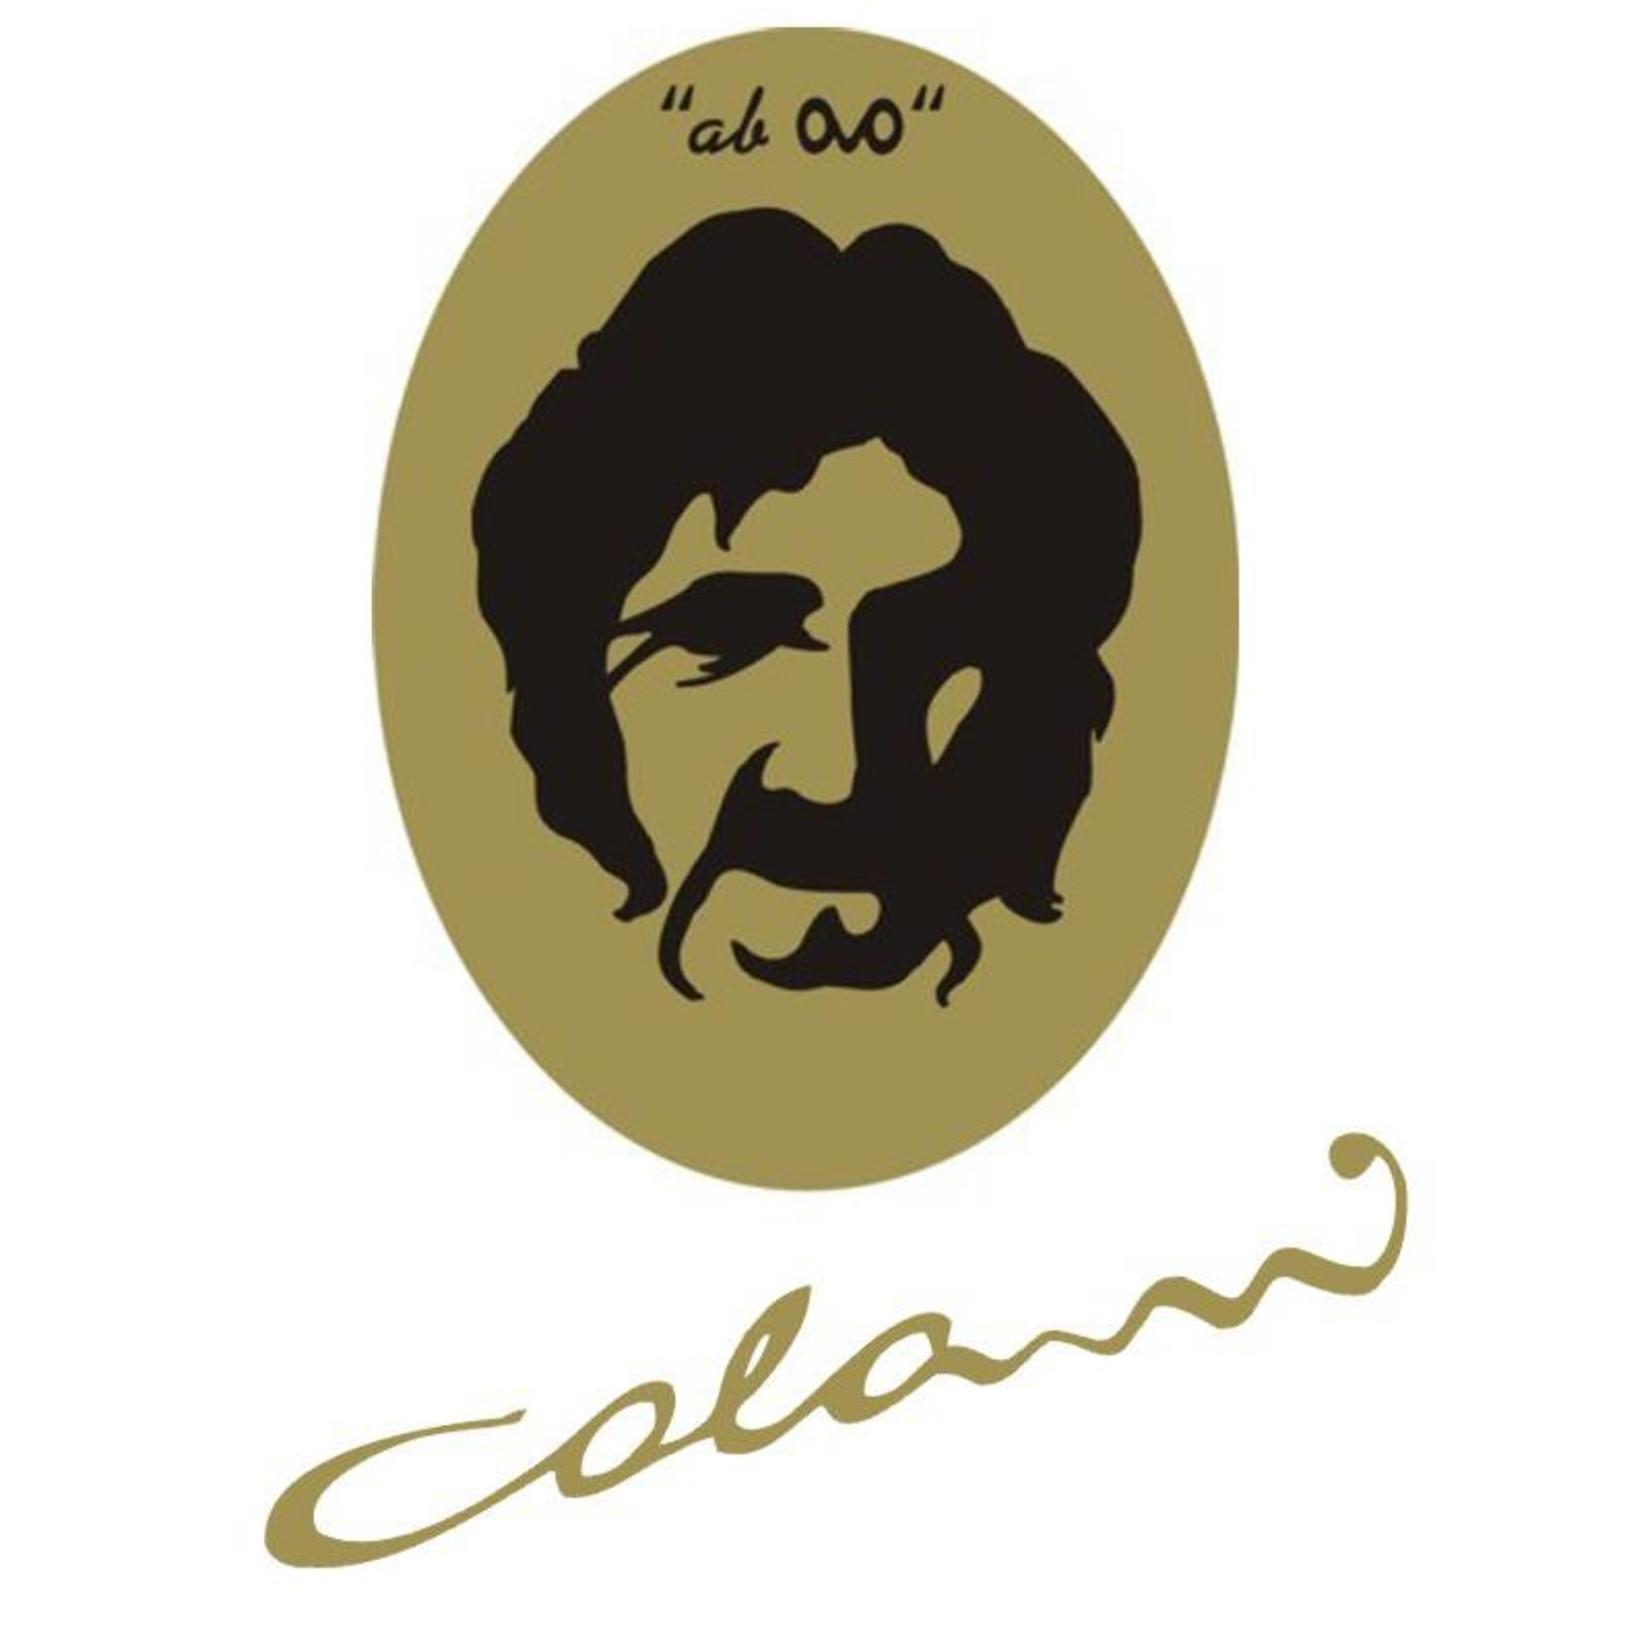 Colani Porzellanserie Colani Espressotasse, groß | Tasse inkl. Unterteller | blau